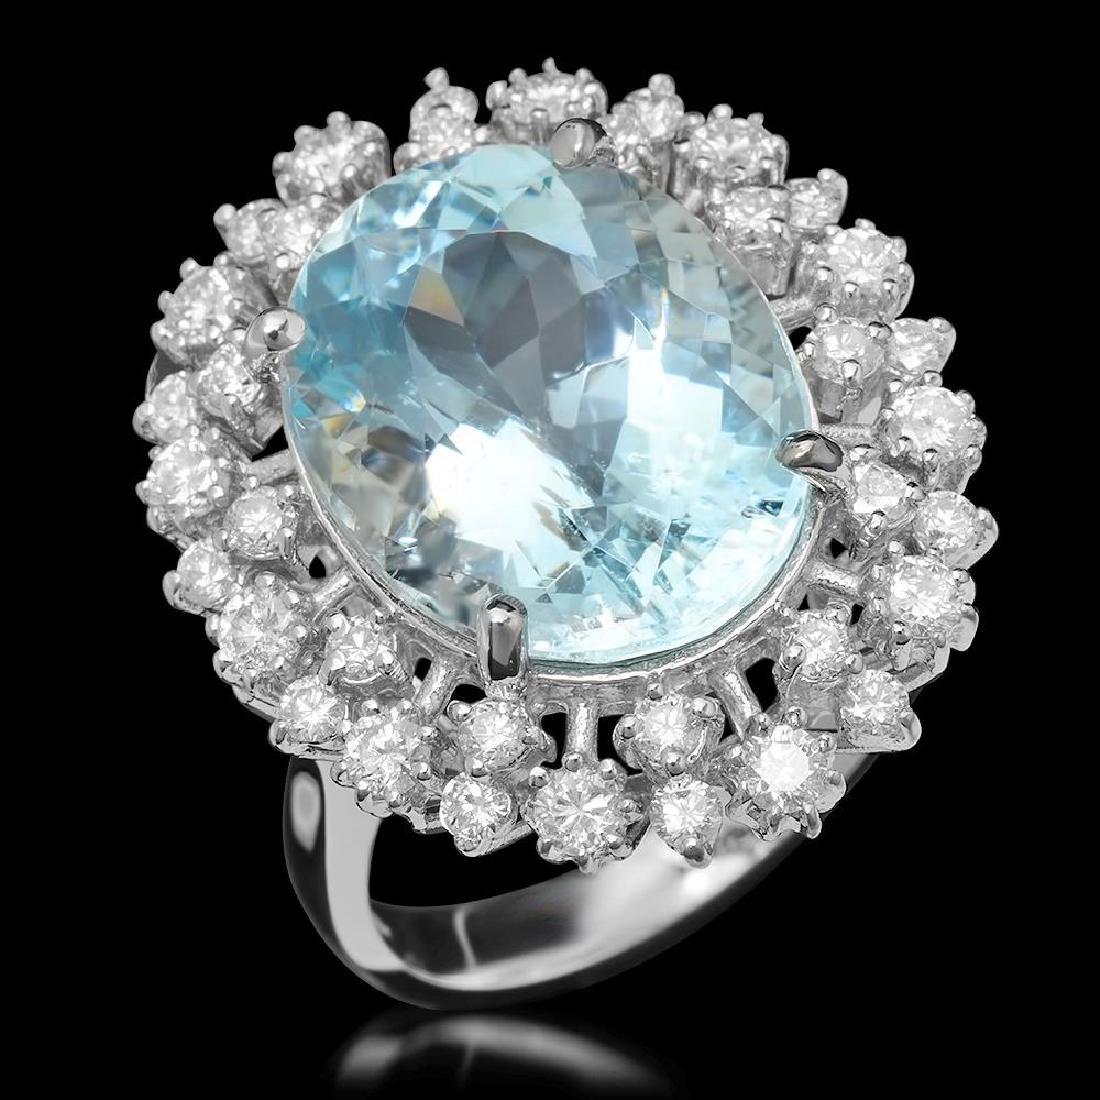 14K Gold 10.53ct Aquamarine & 1.27ct Diamond Ring